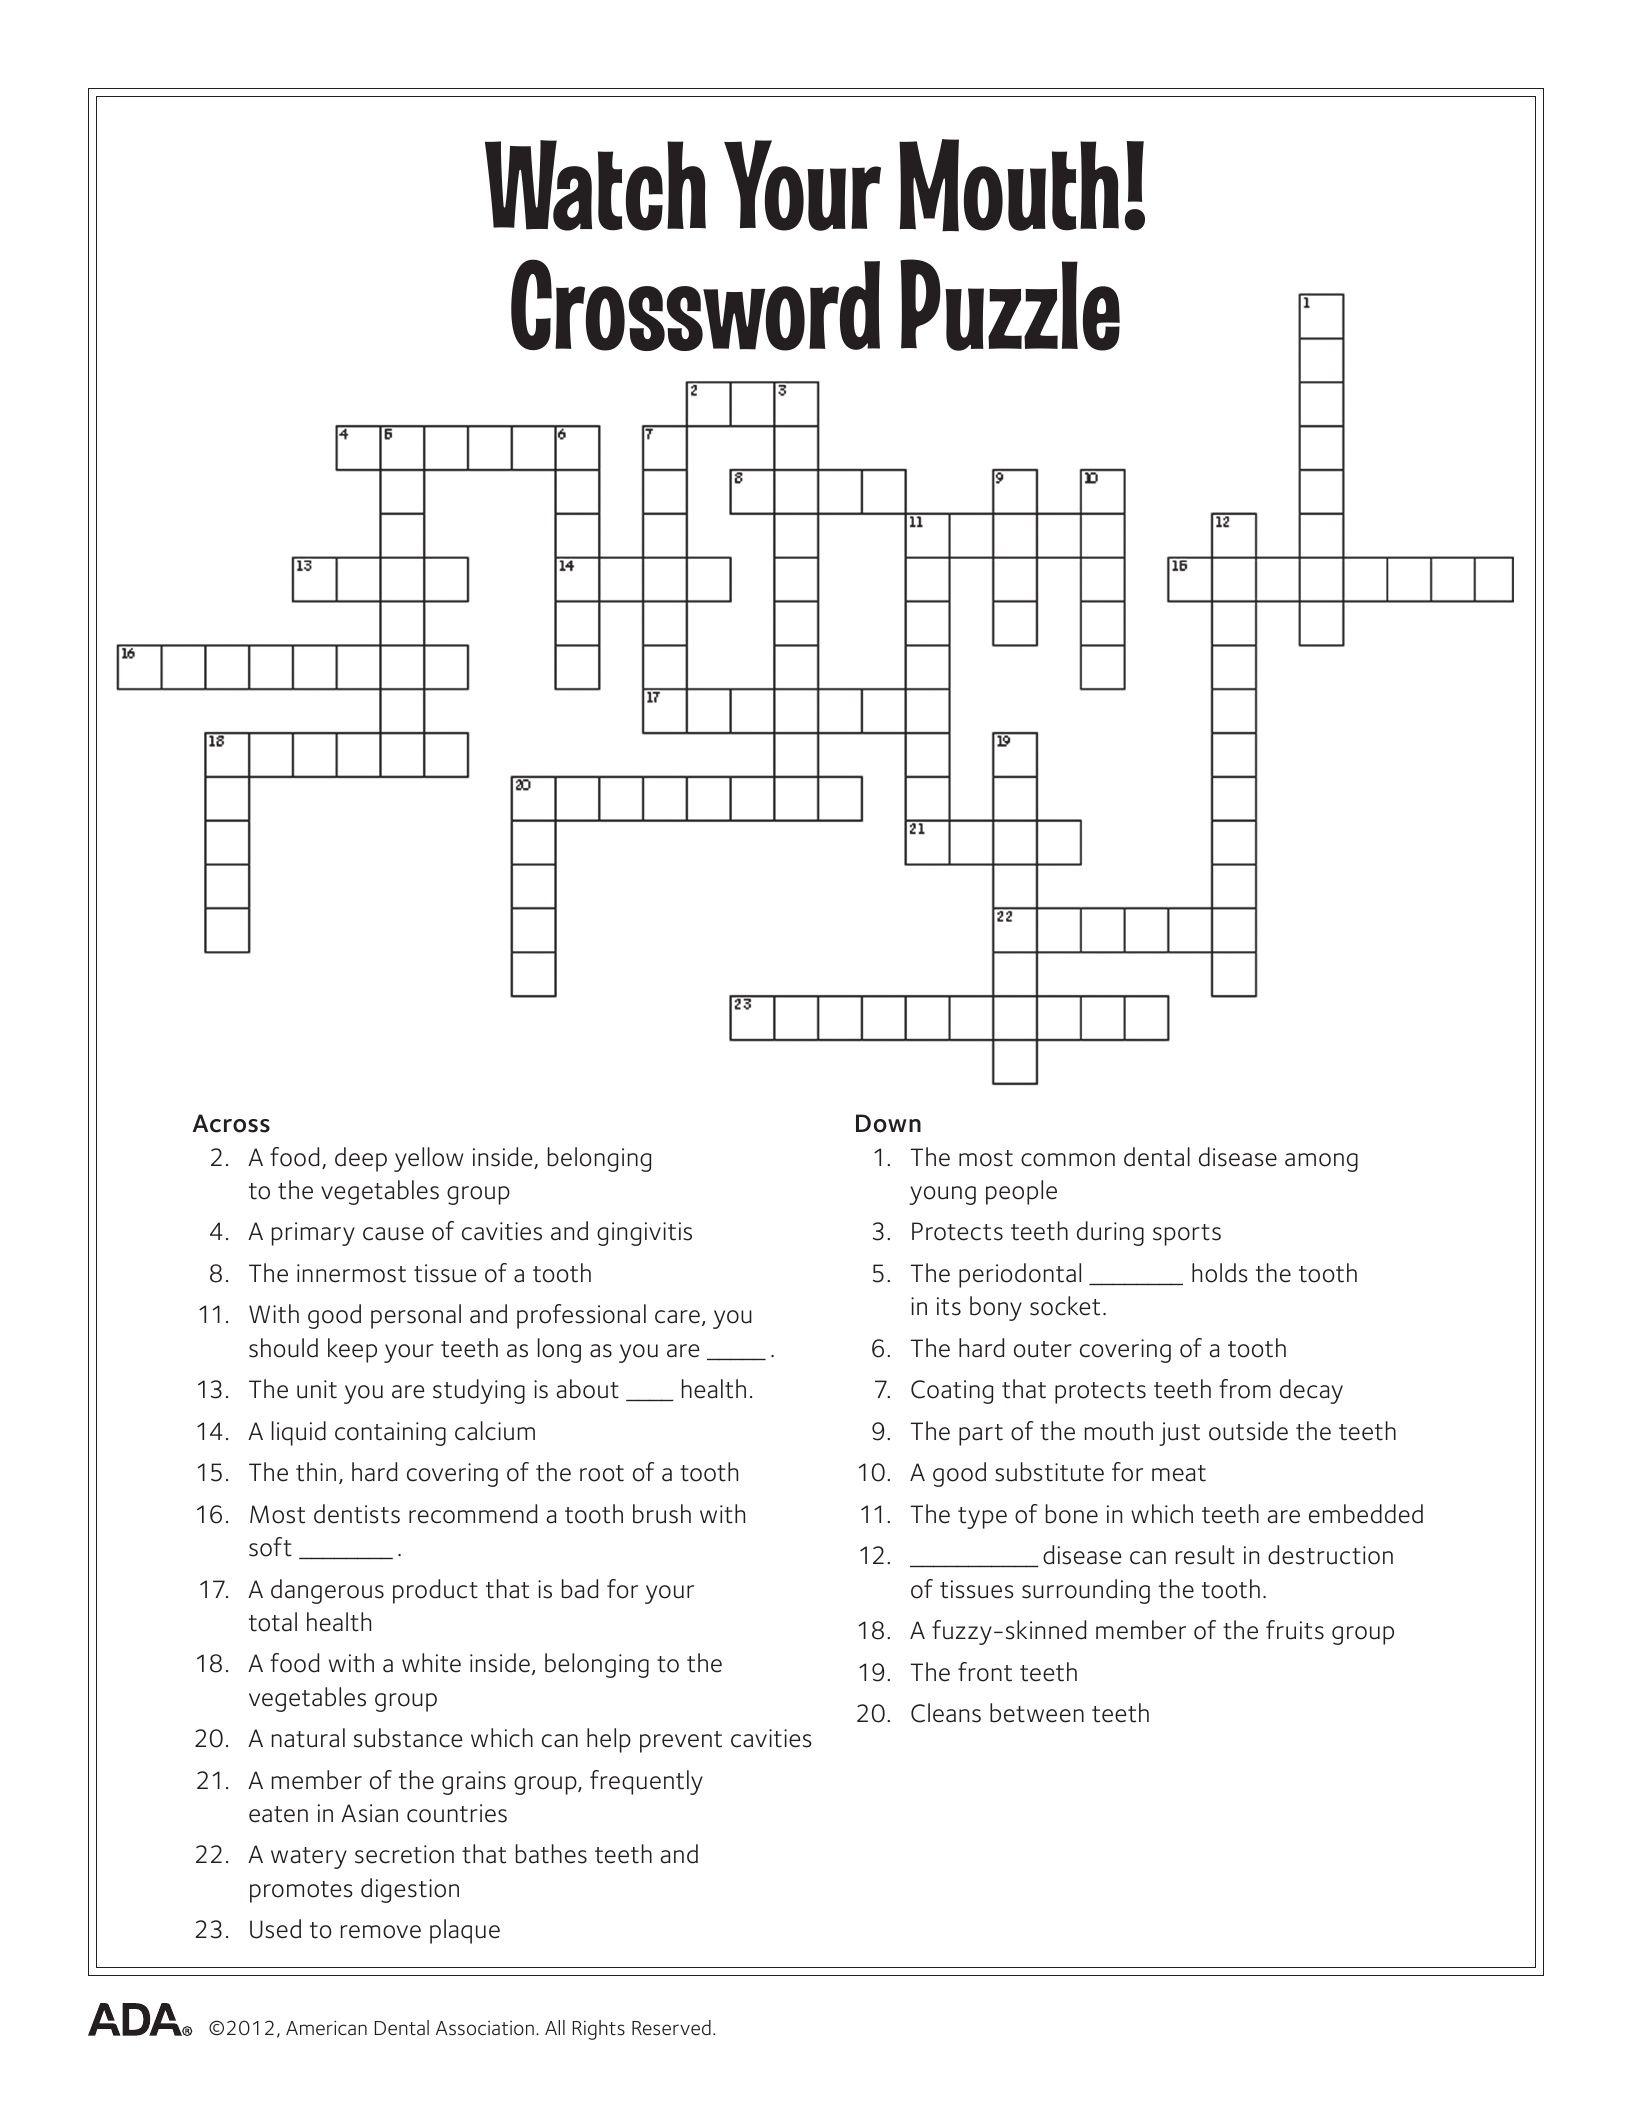 11 Dental Health Activities Puzzle Fun (Printable)   Dental Hygiene - Free Printable Crossword Puzzles Health